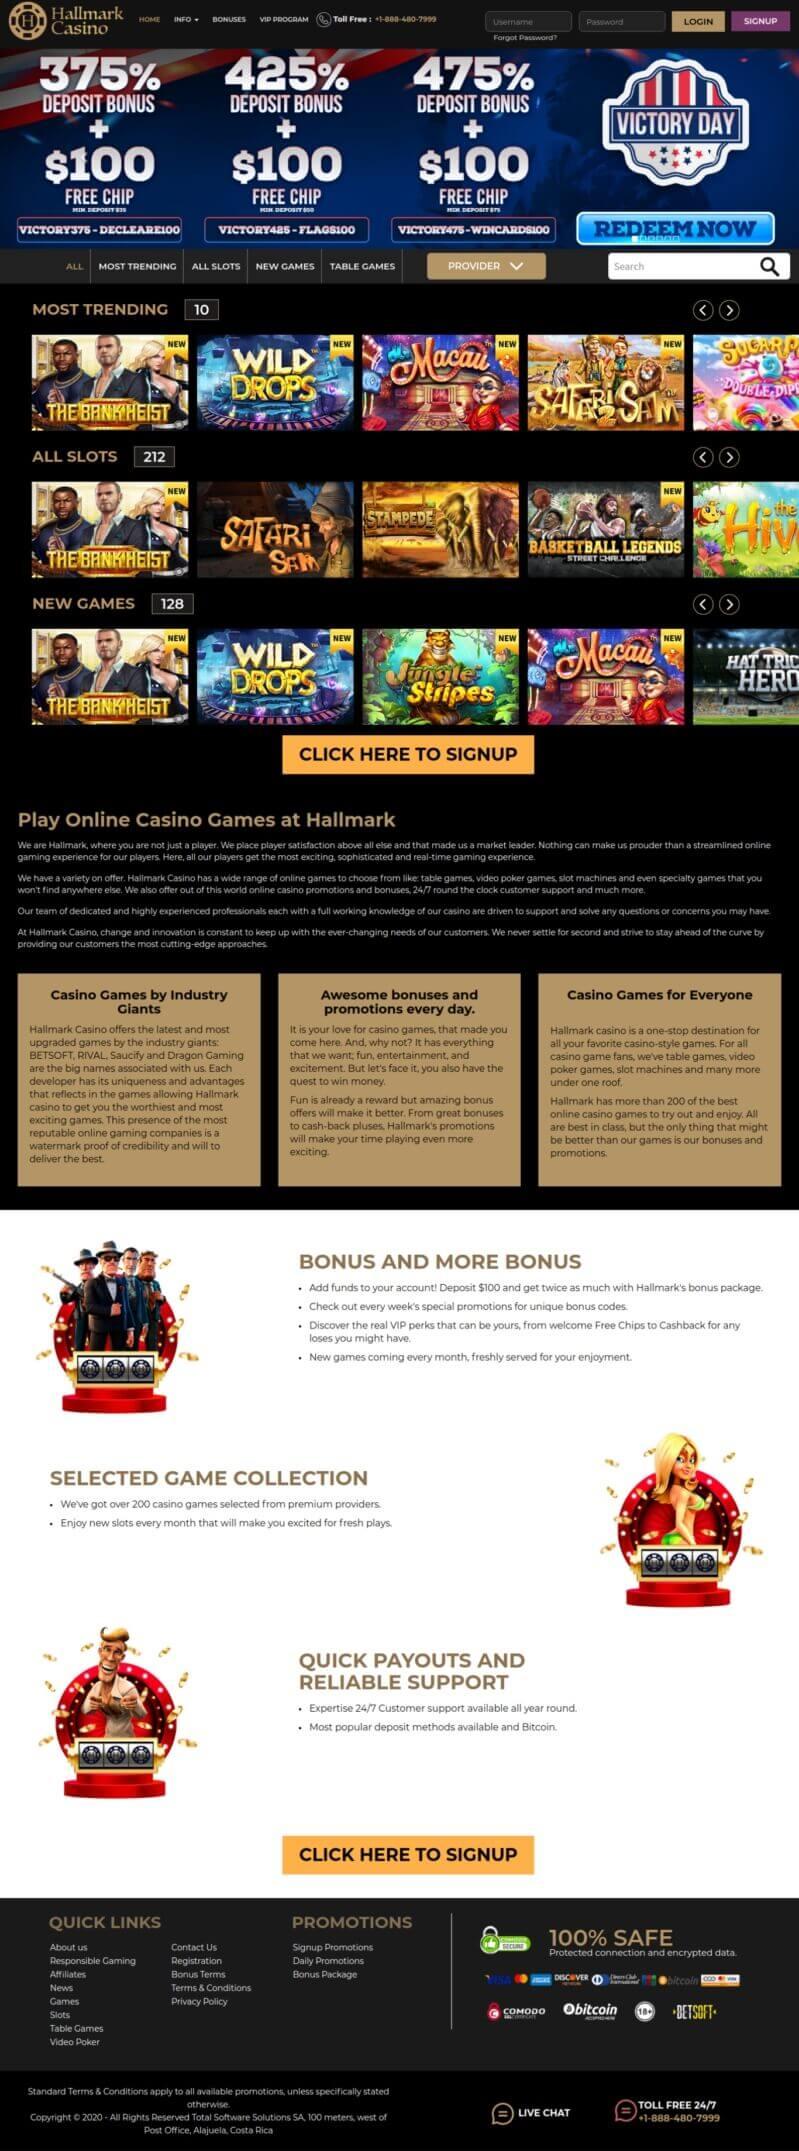 Hallmark Casino Review 2021